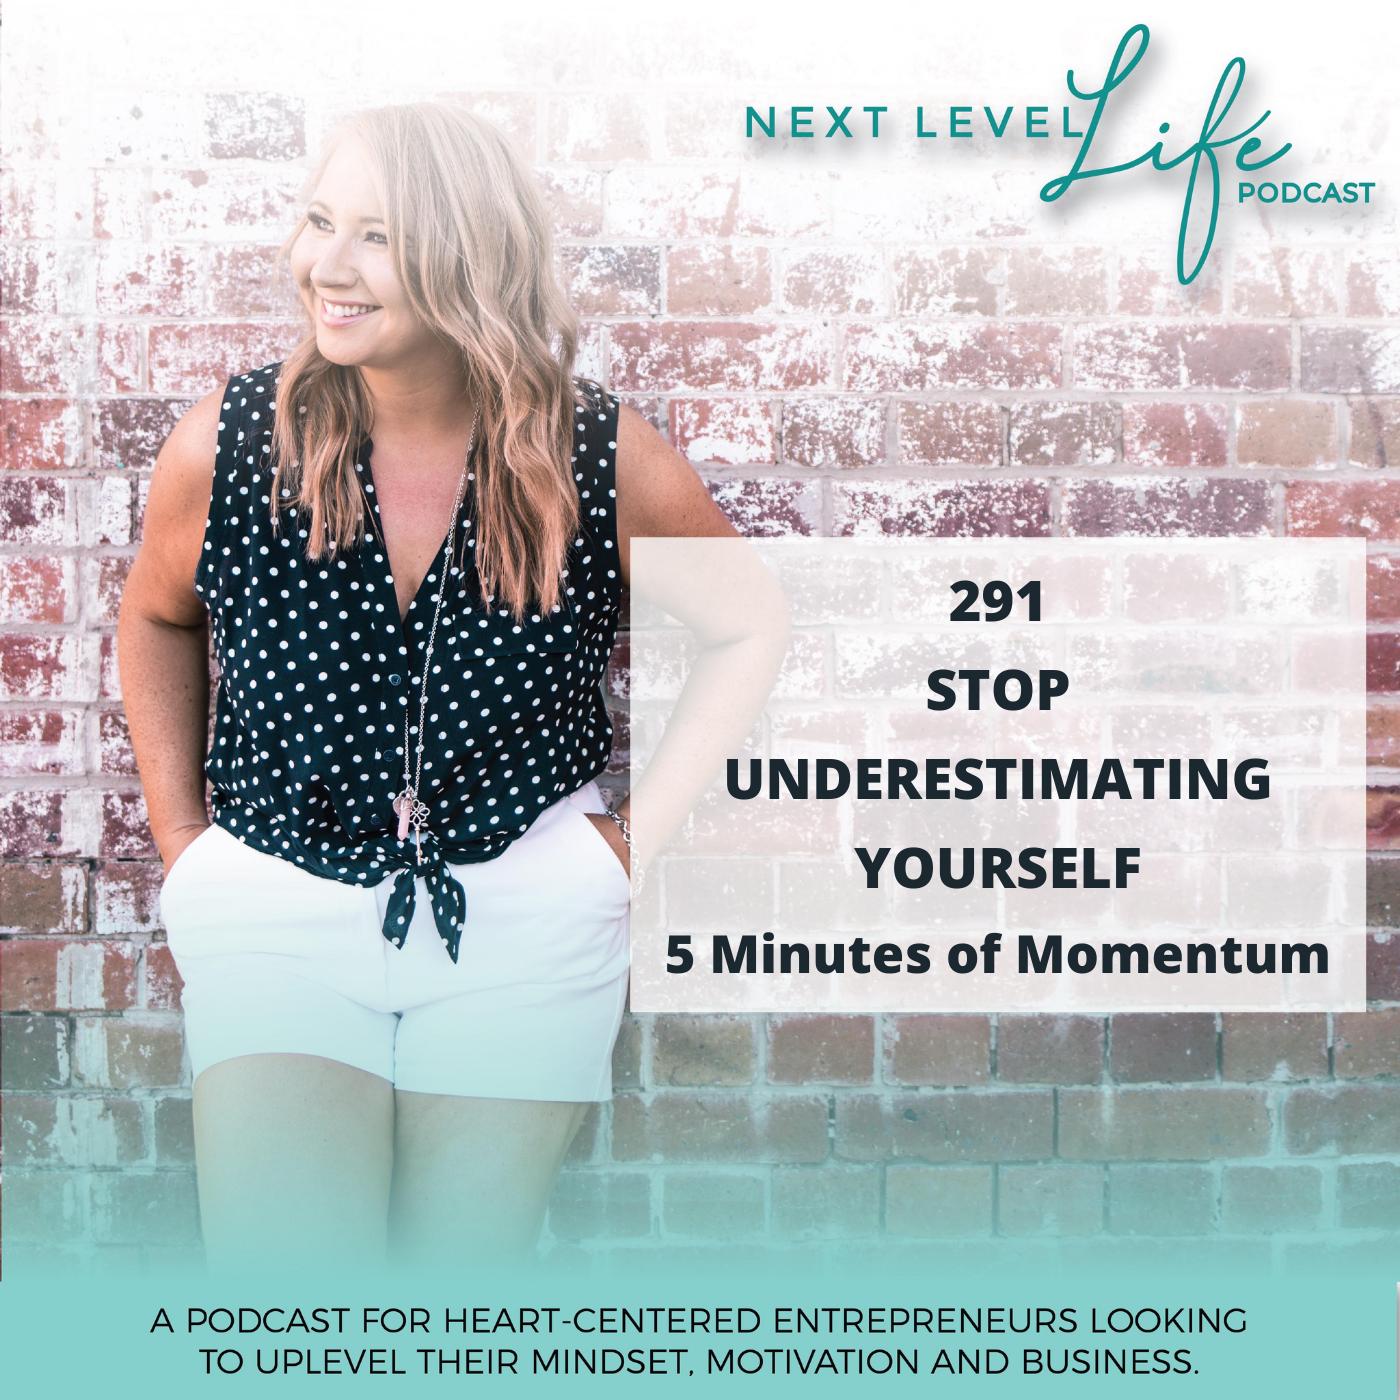 next level life podcast